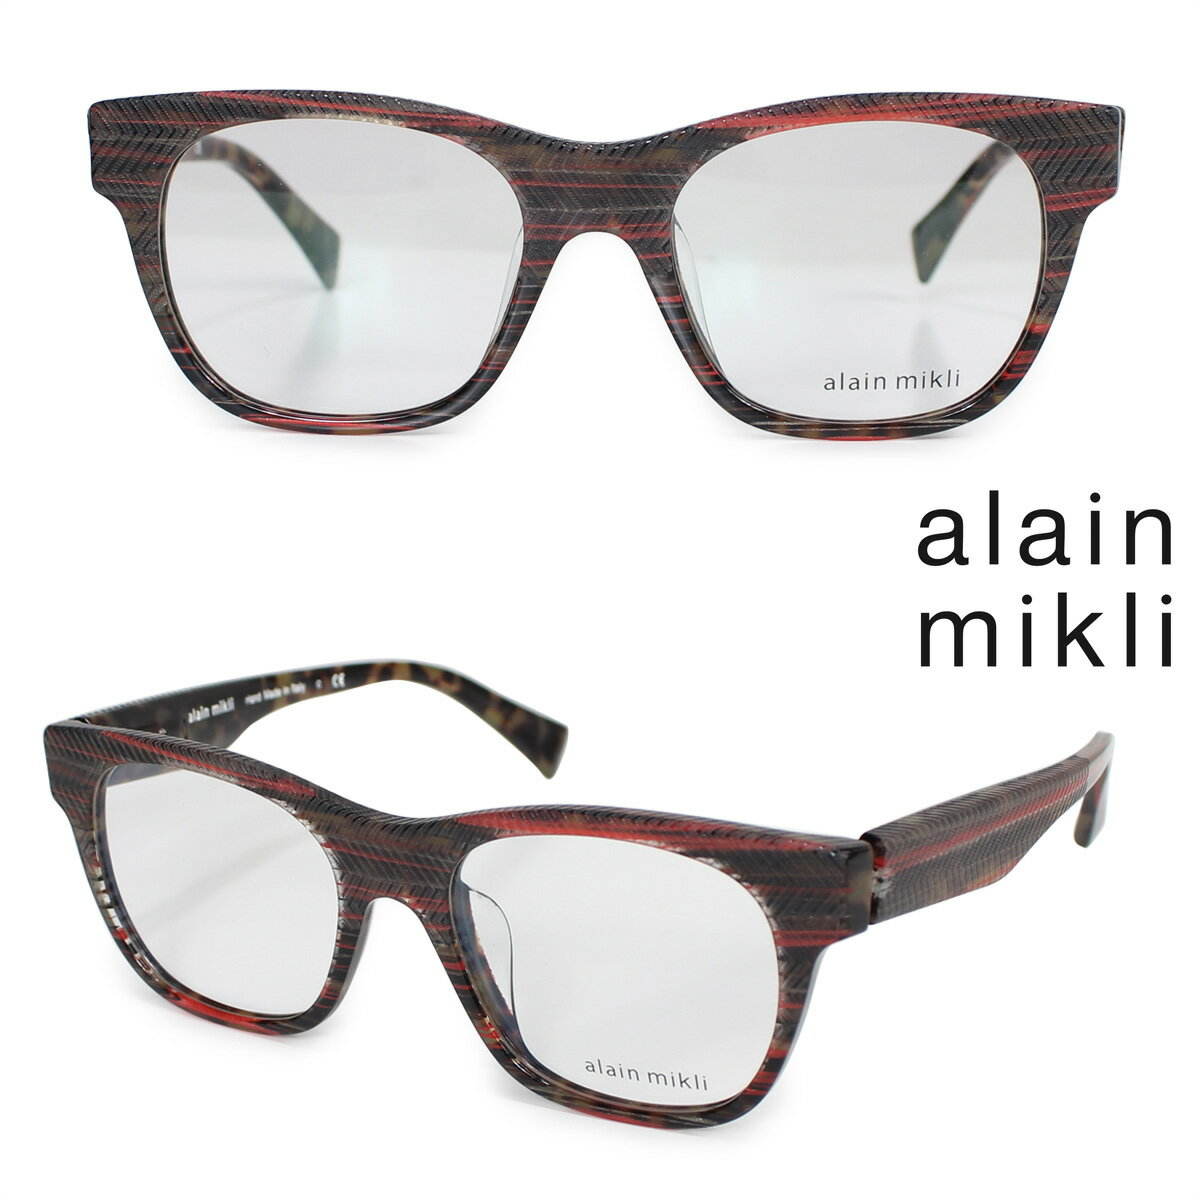 alain mikli アランミクリ メガネ メガネフレーム 眼鏡 フランス製 メンズ レディース